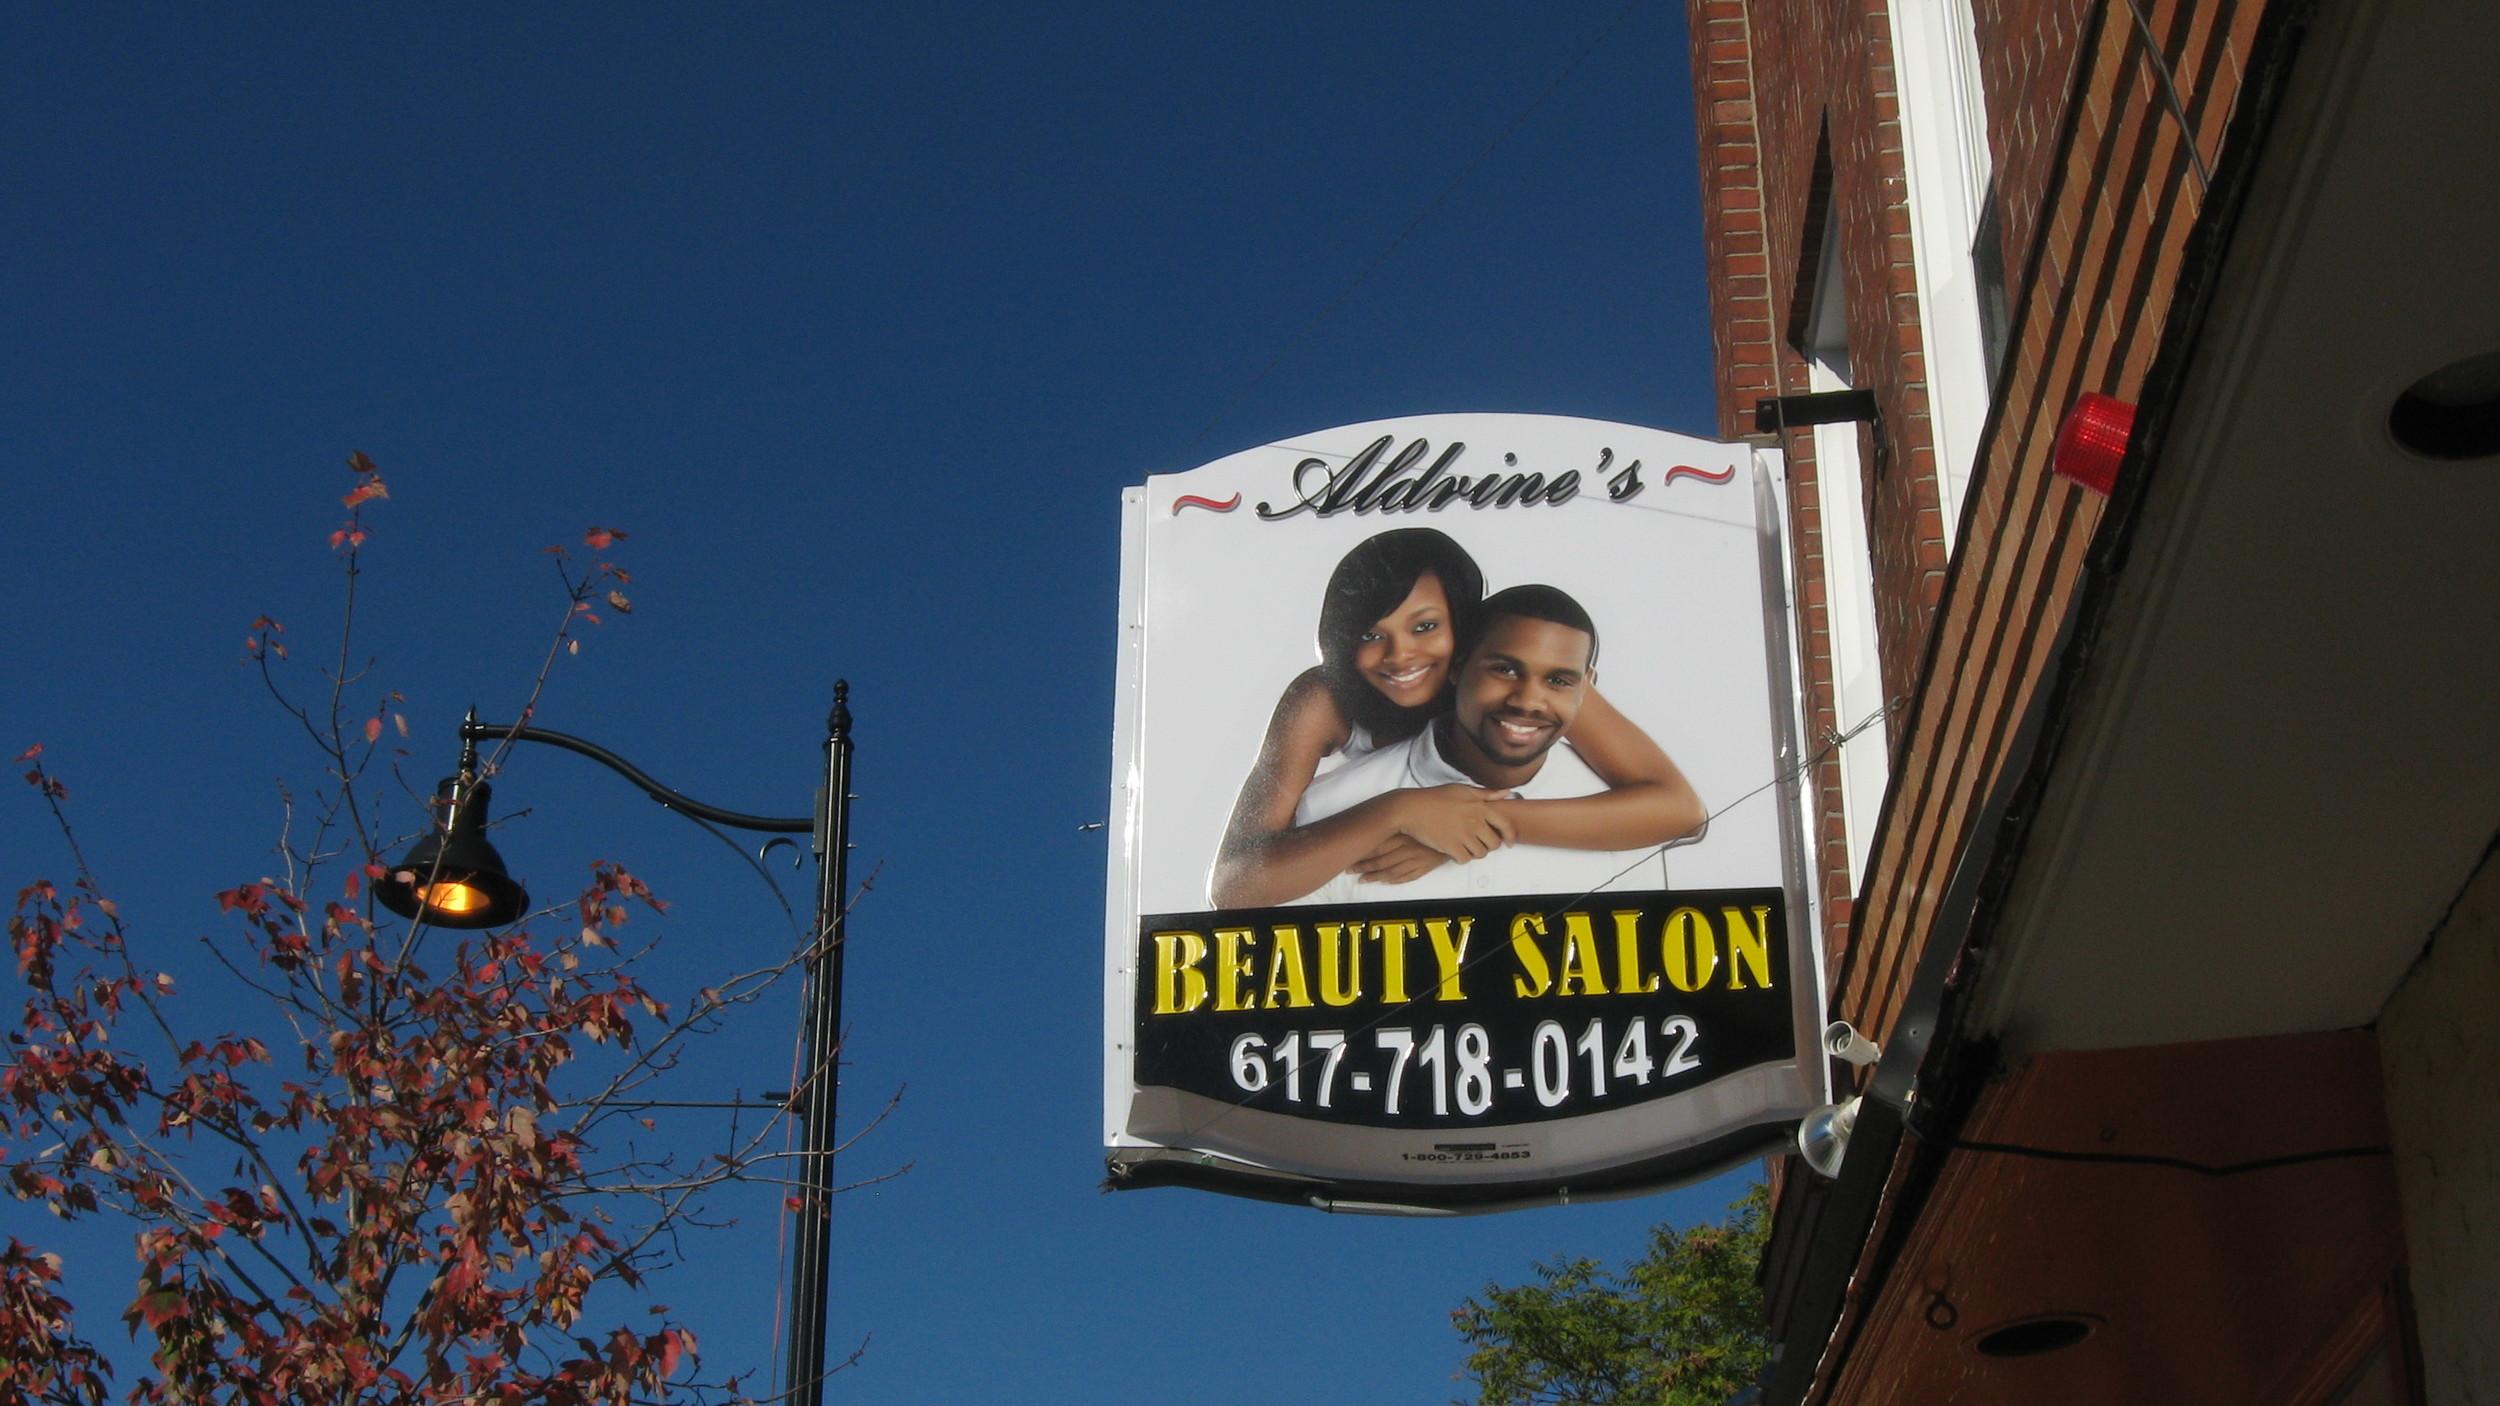 Aldrine Beauty Salon, Somerville, MA